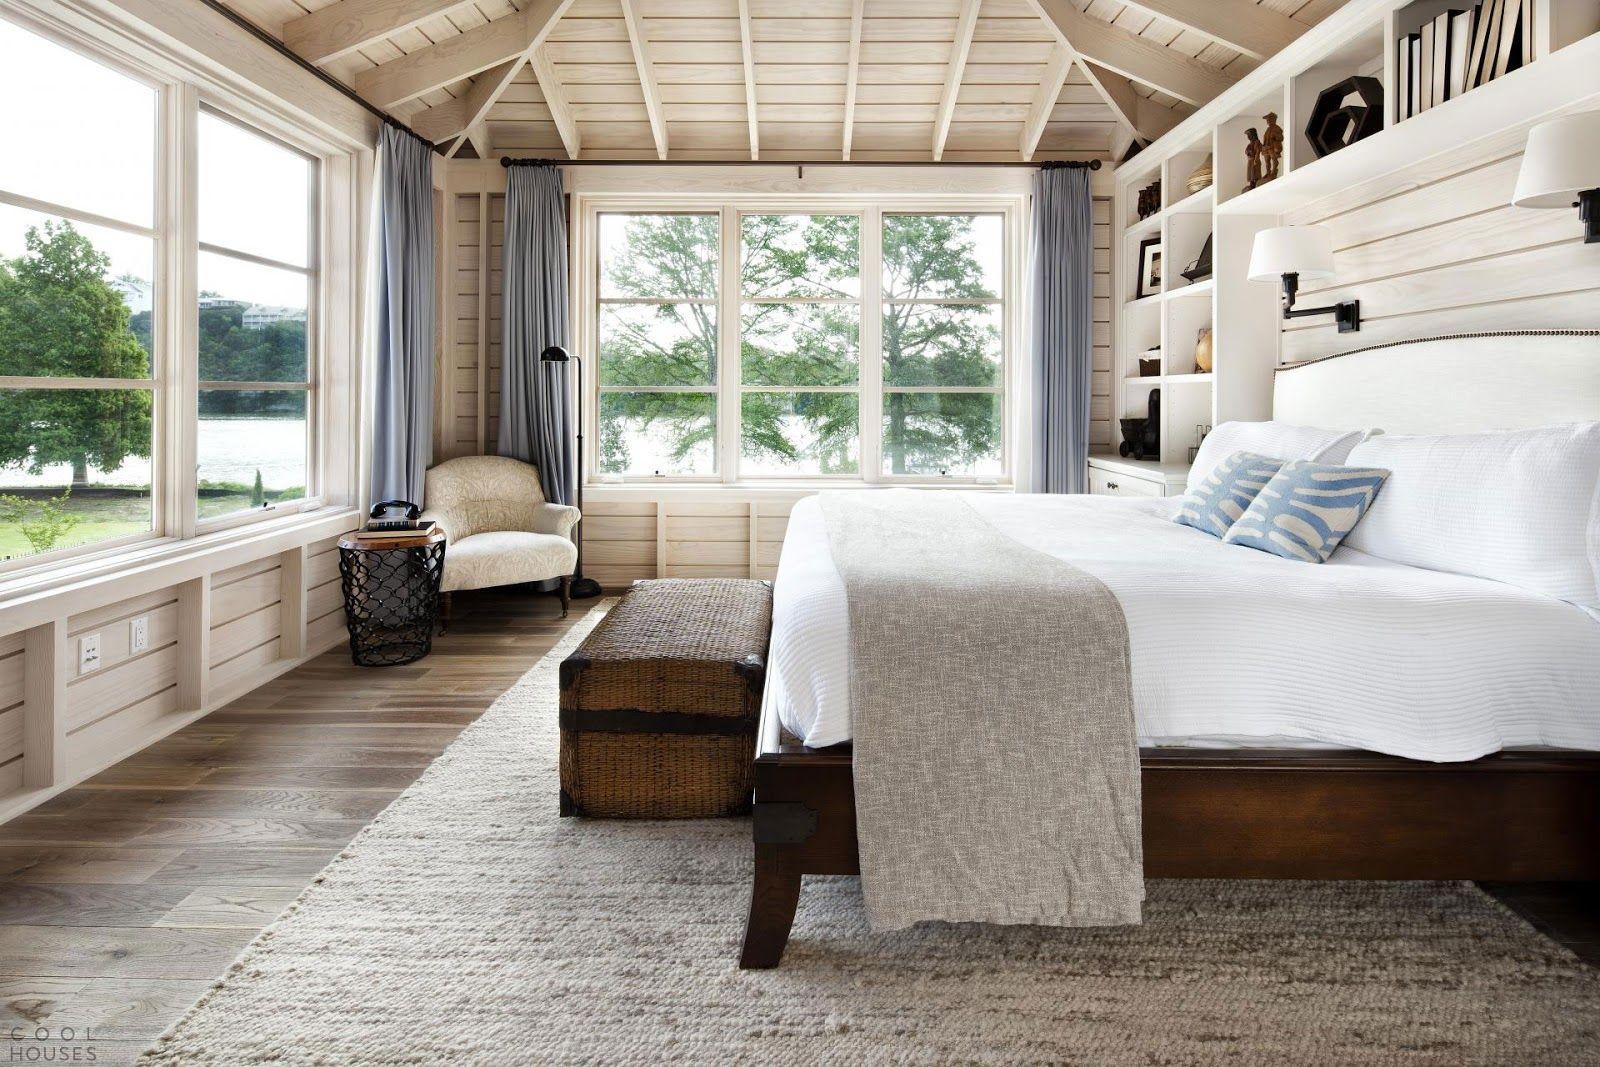 40 Chic Beach House Interior Design Ideas Modern Rustic Bedrooms